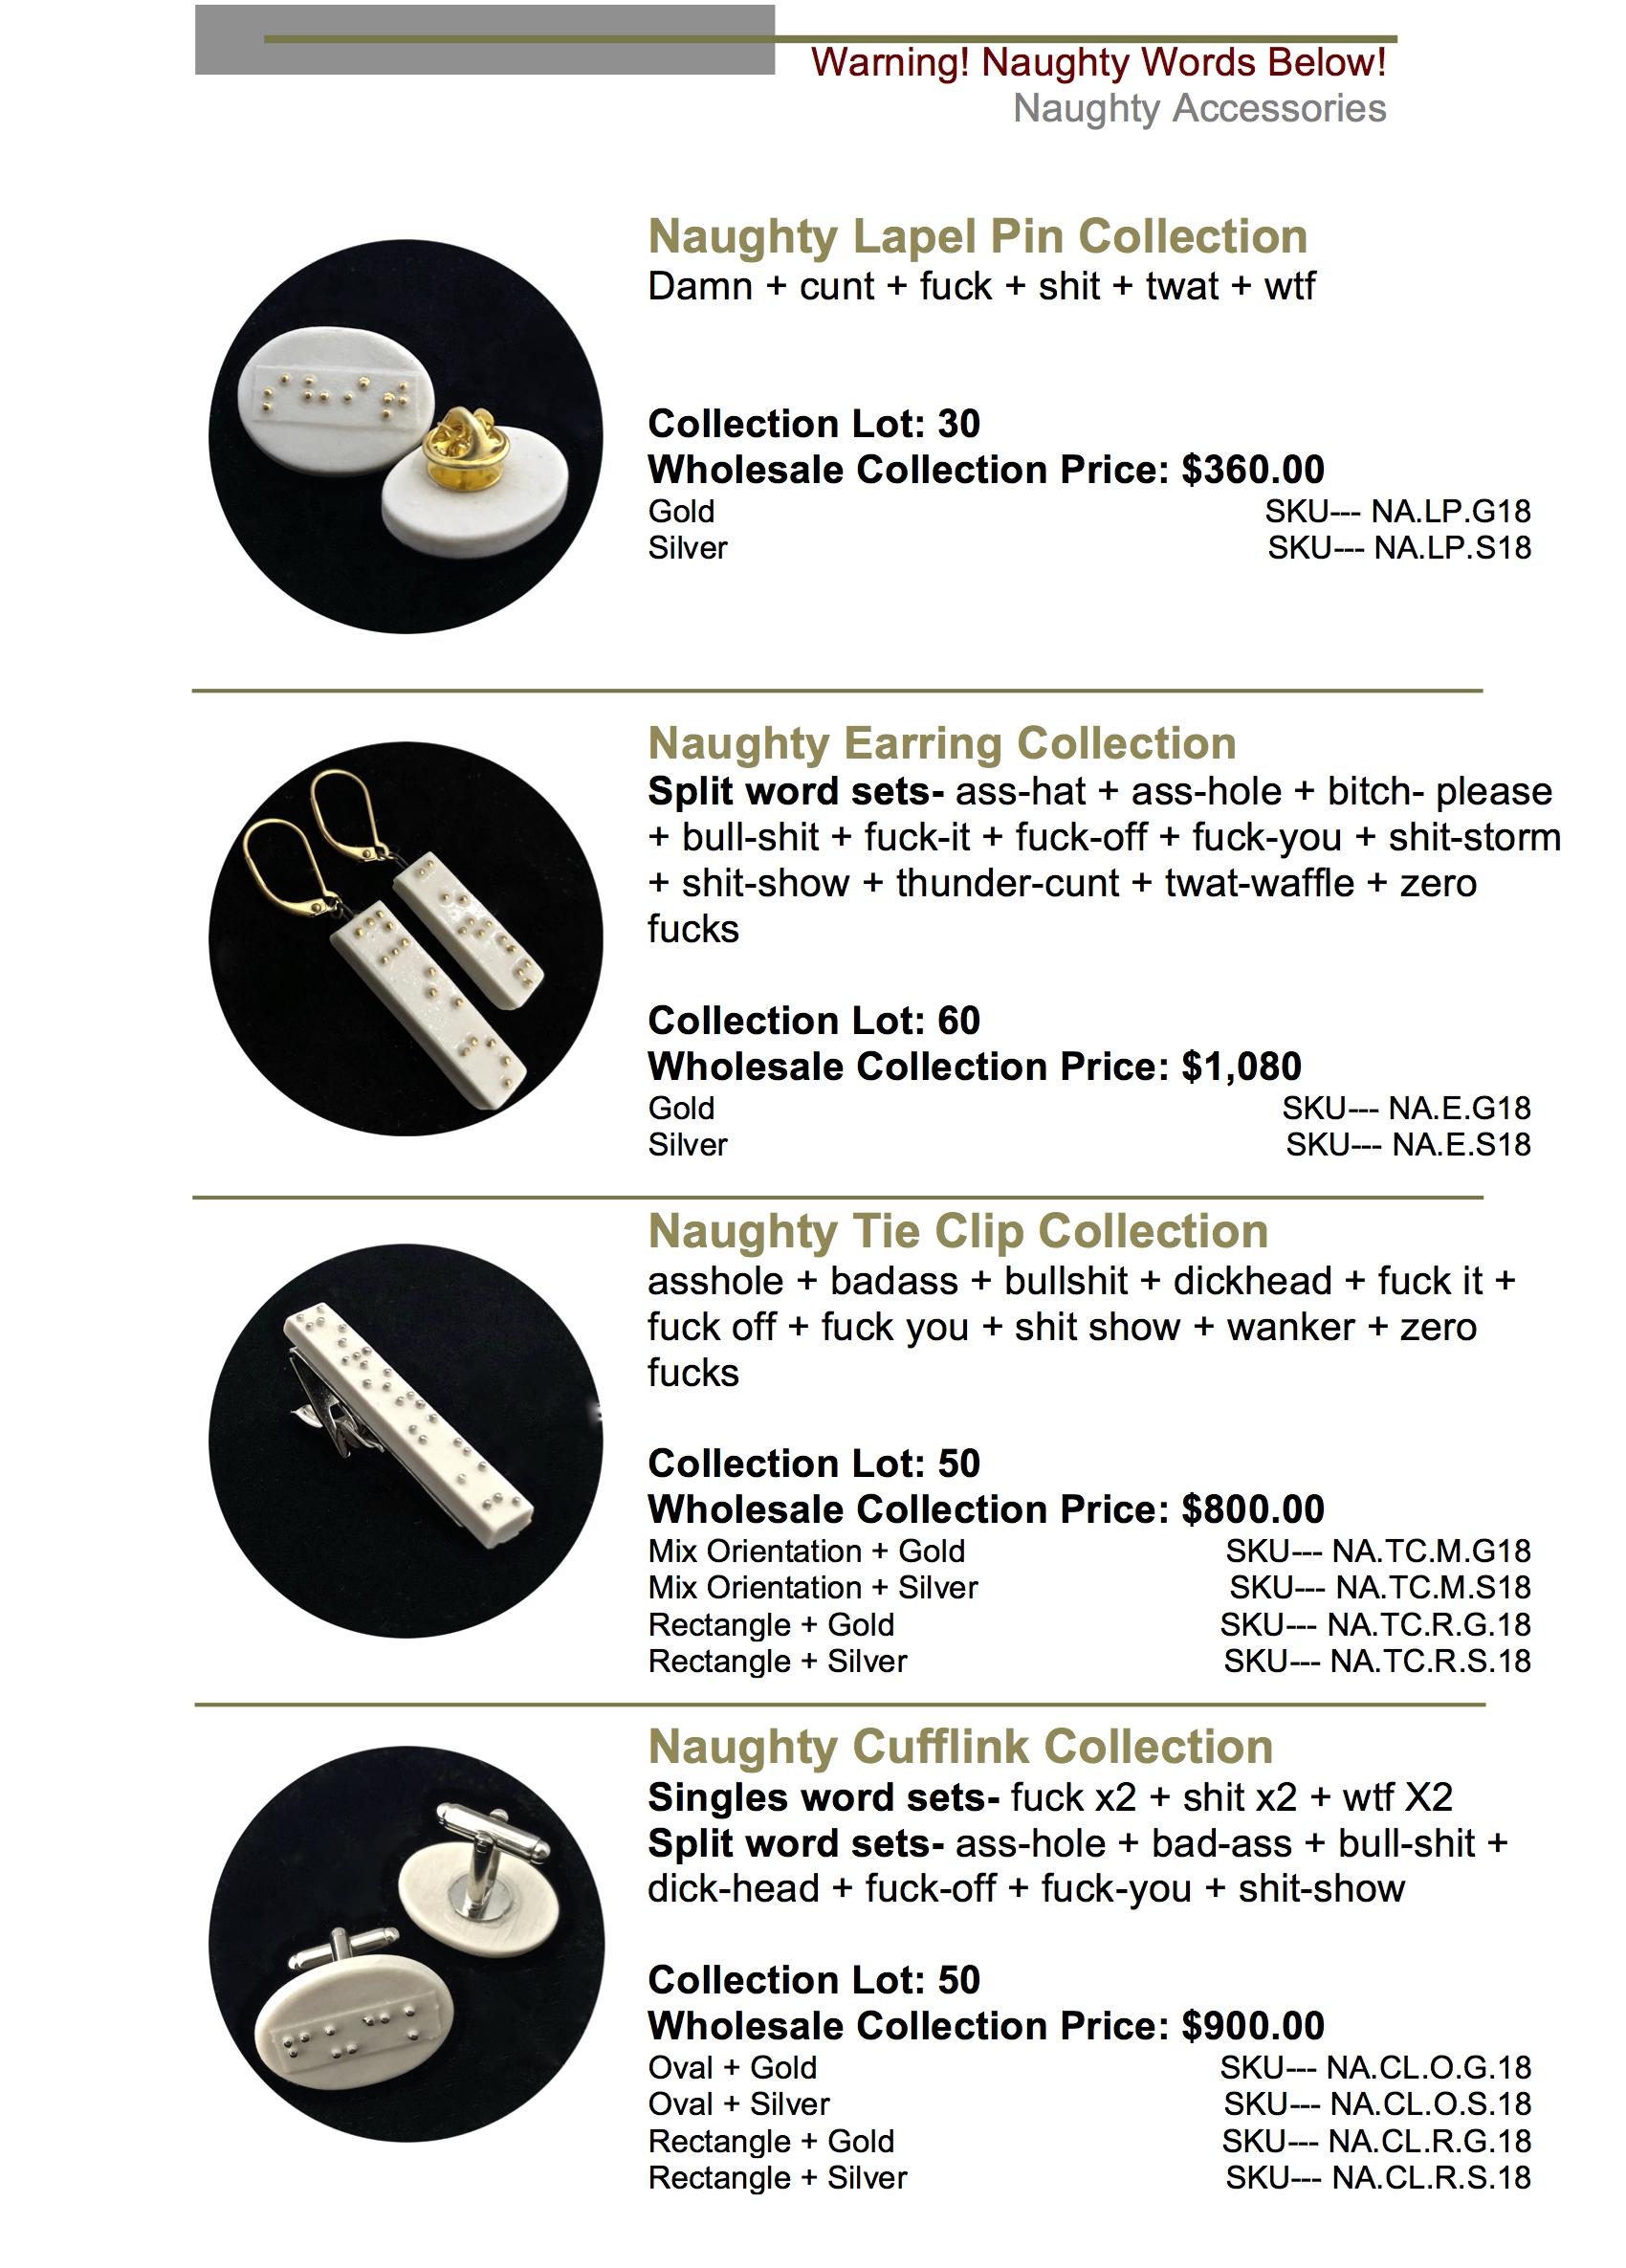 Wholesale Catalog pg 7.jpg